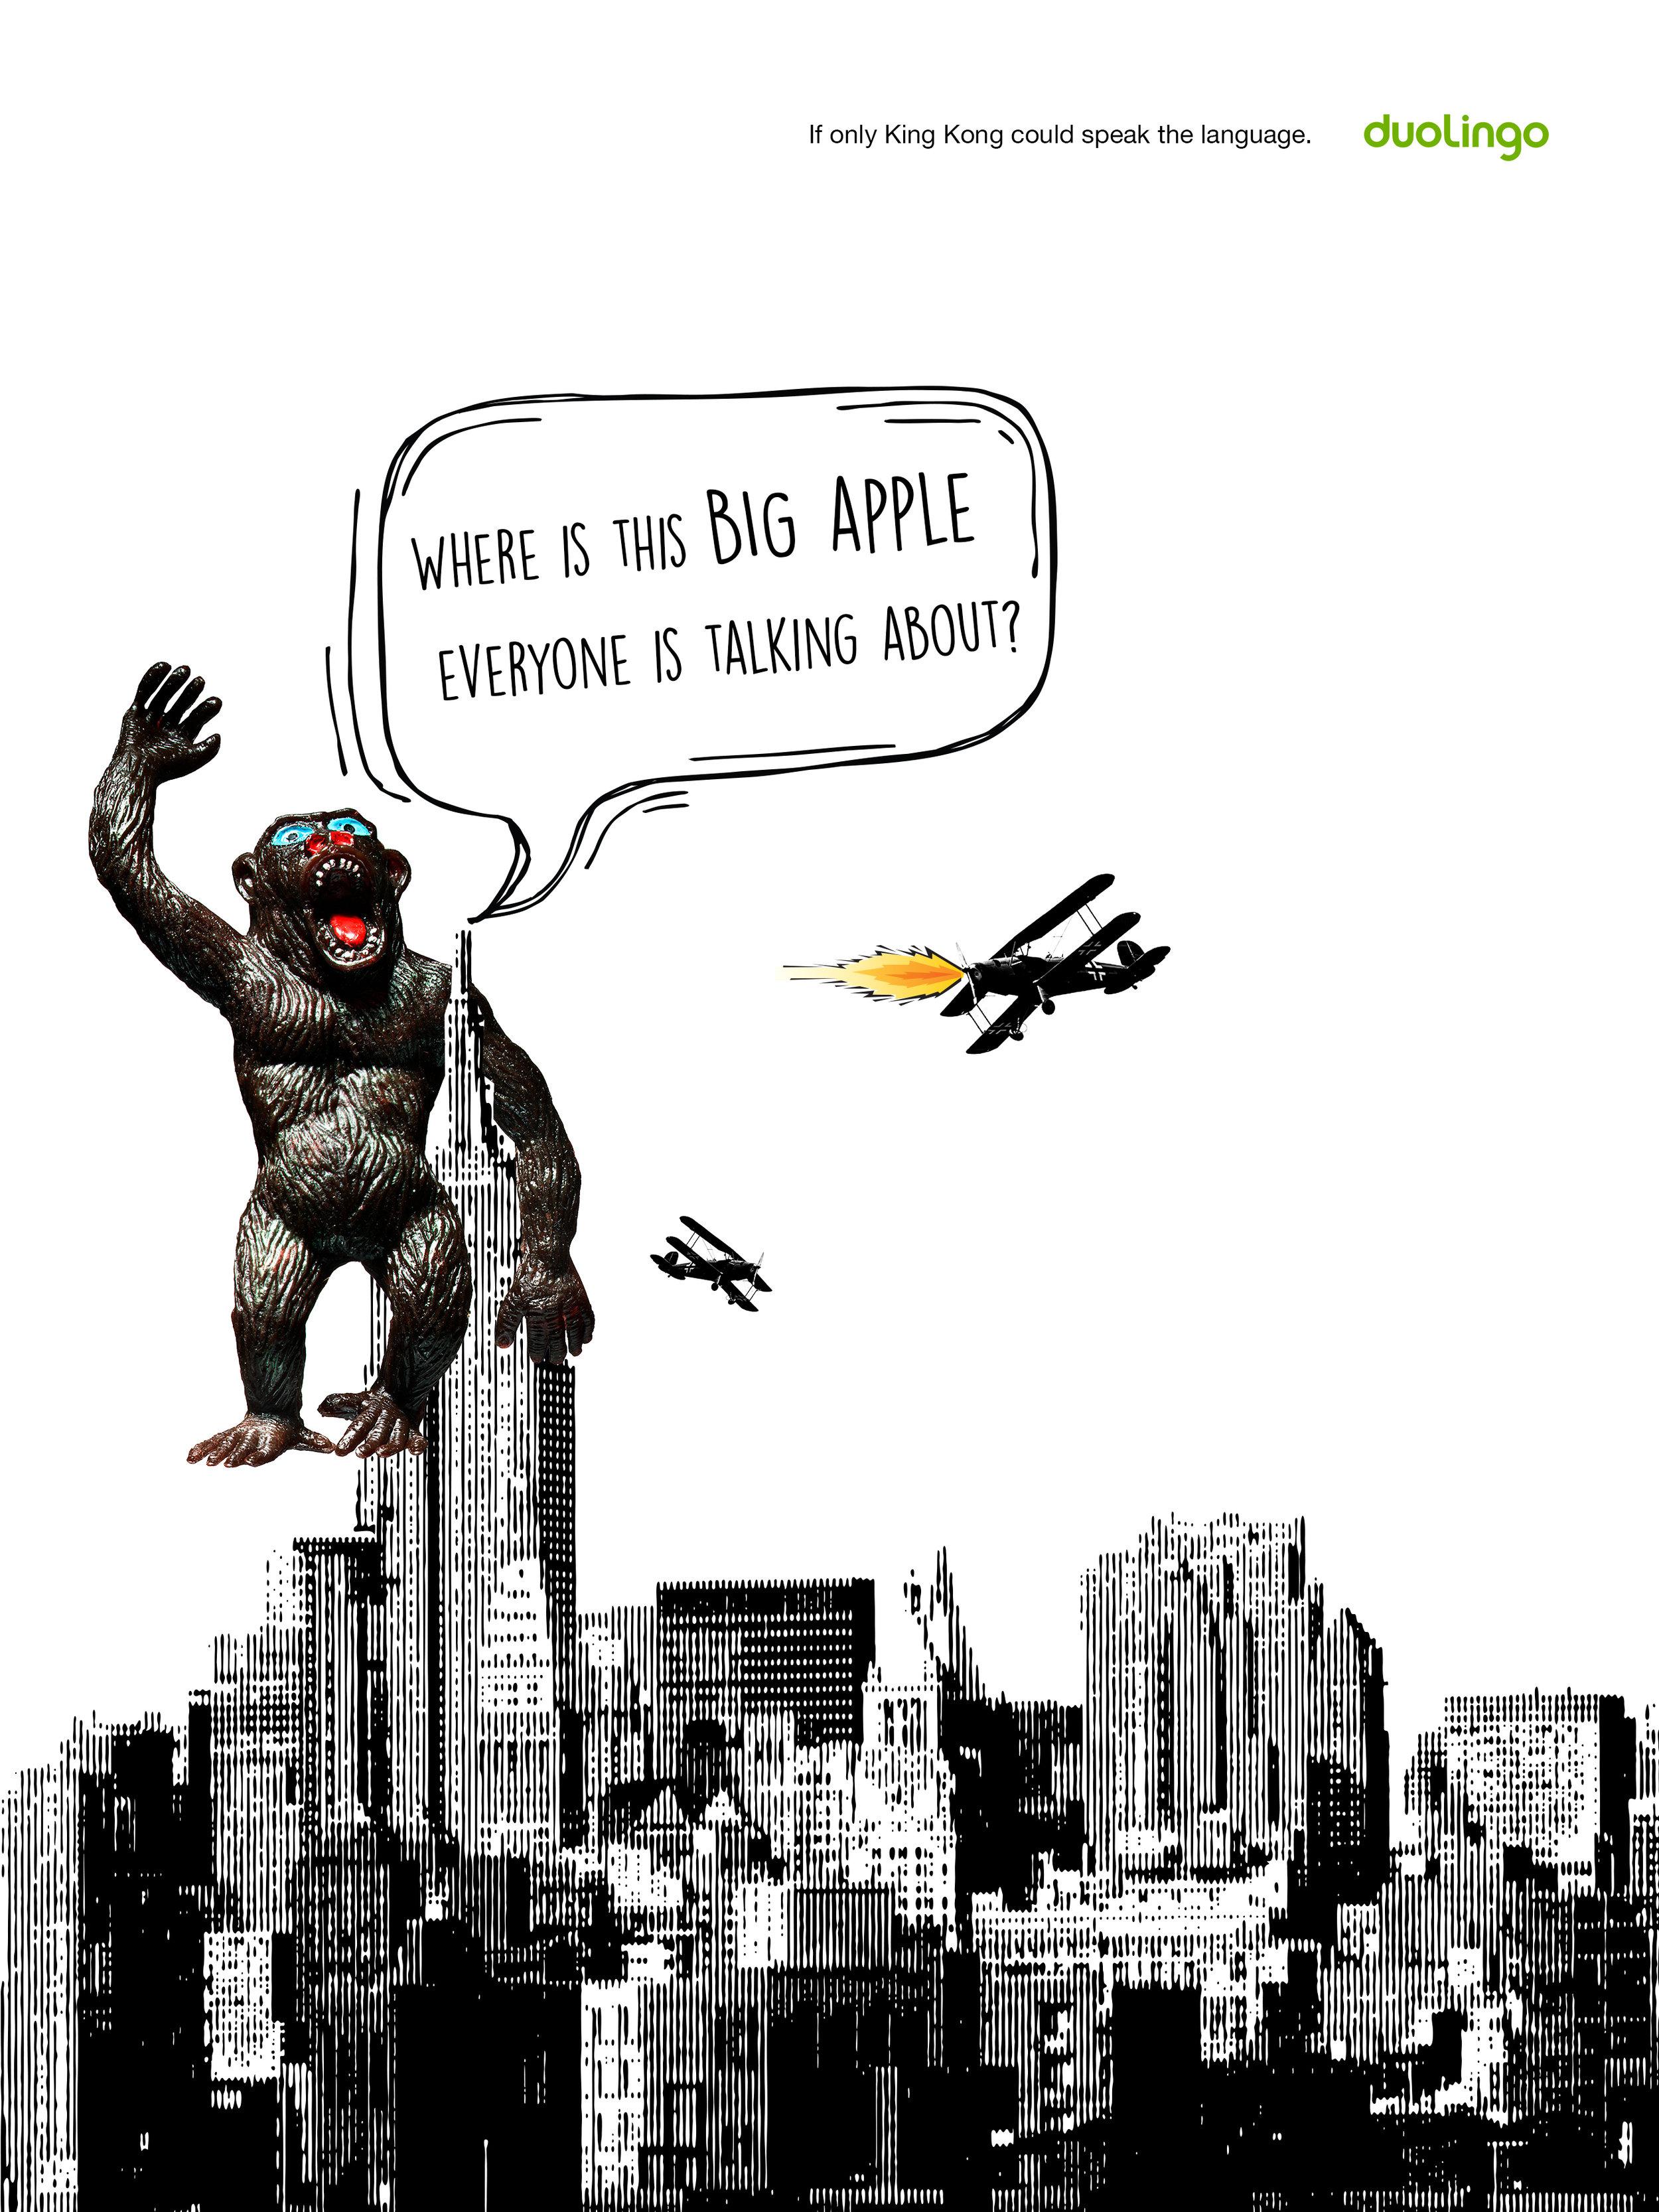 DuoLingo King Kong ok.jpg